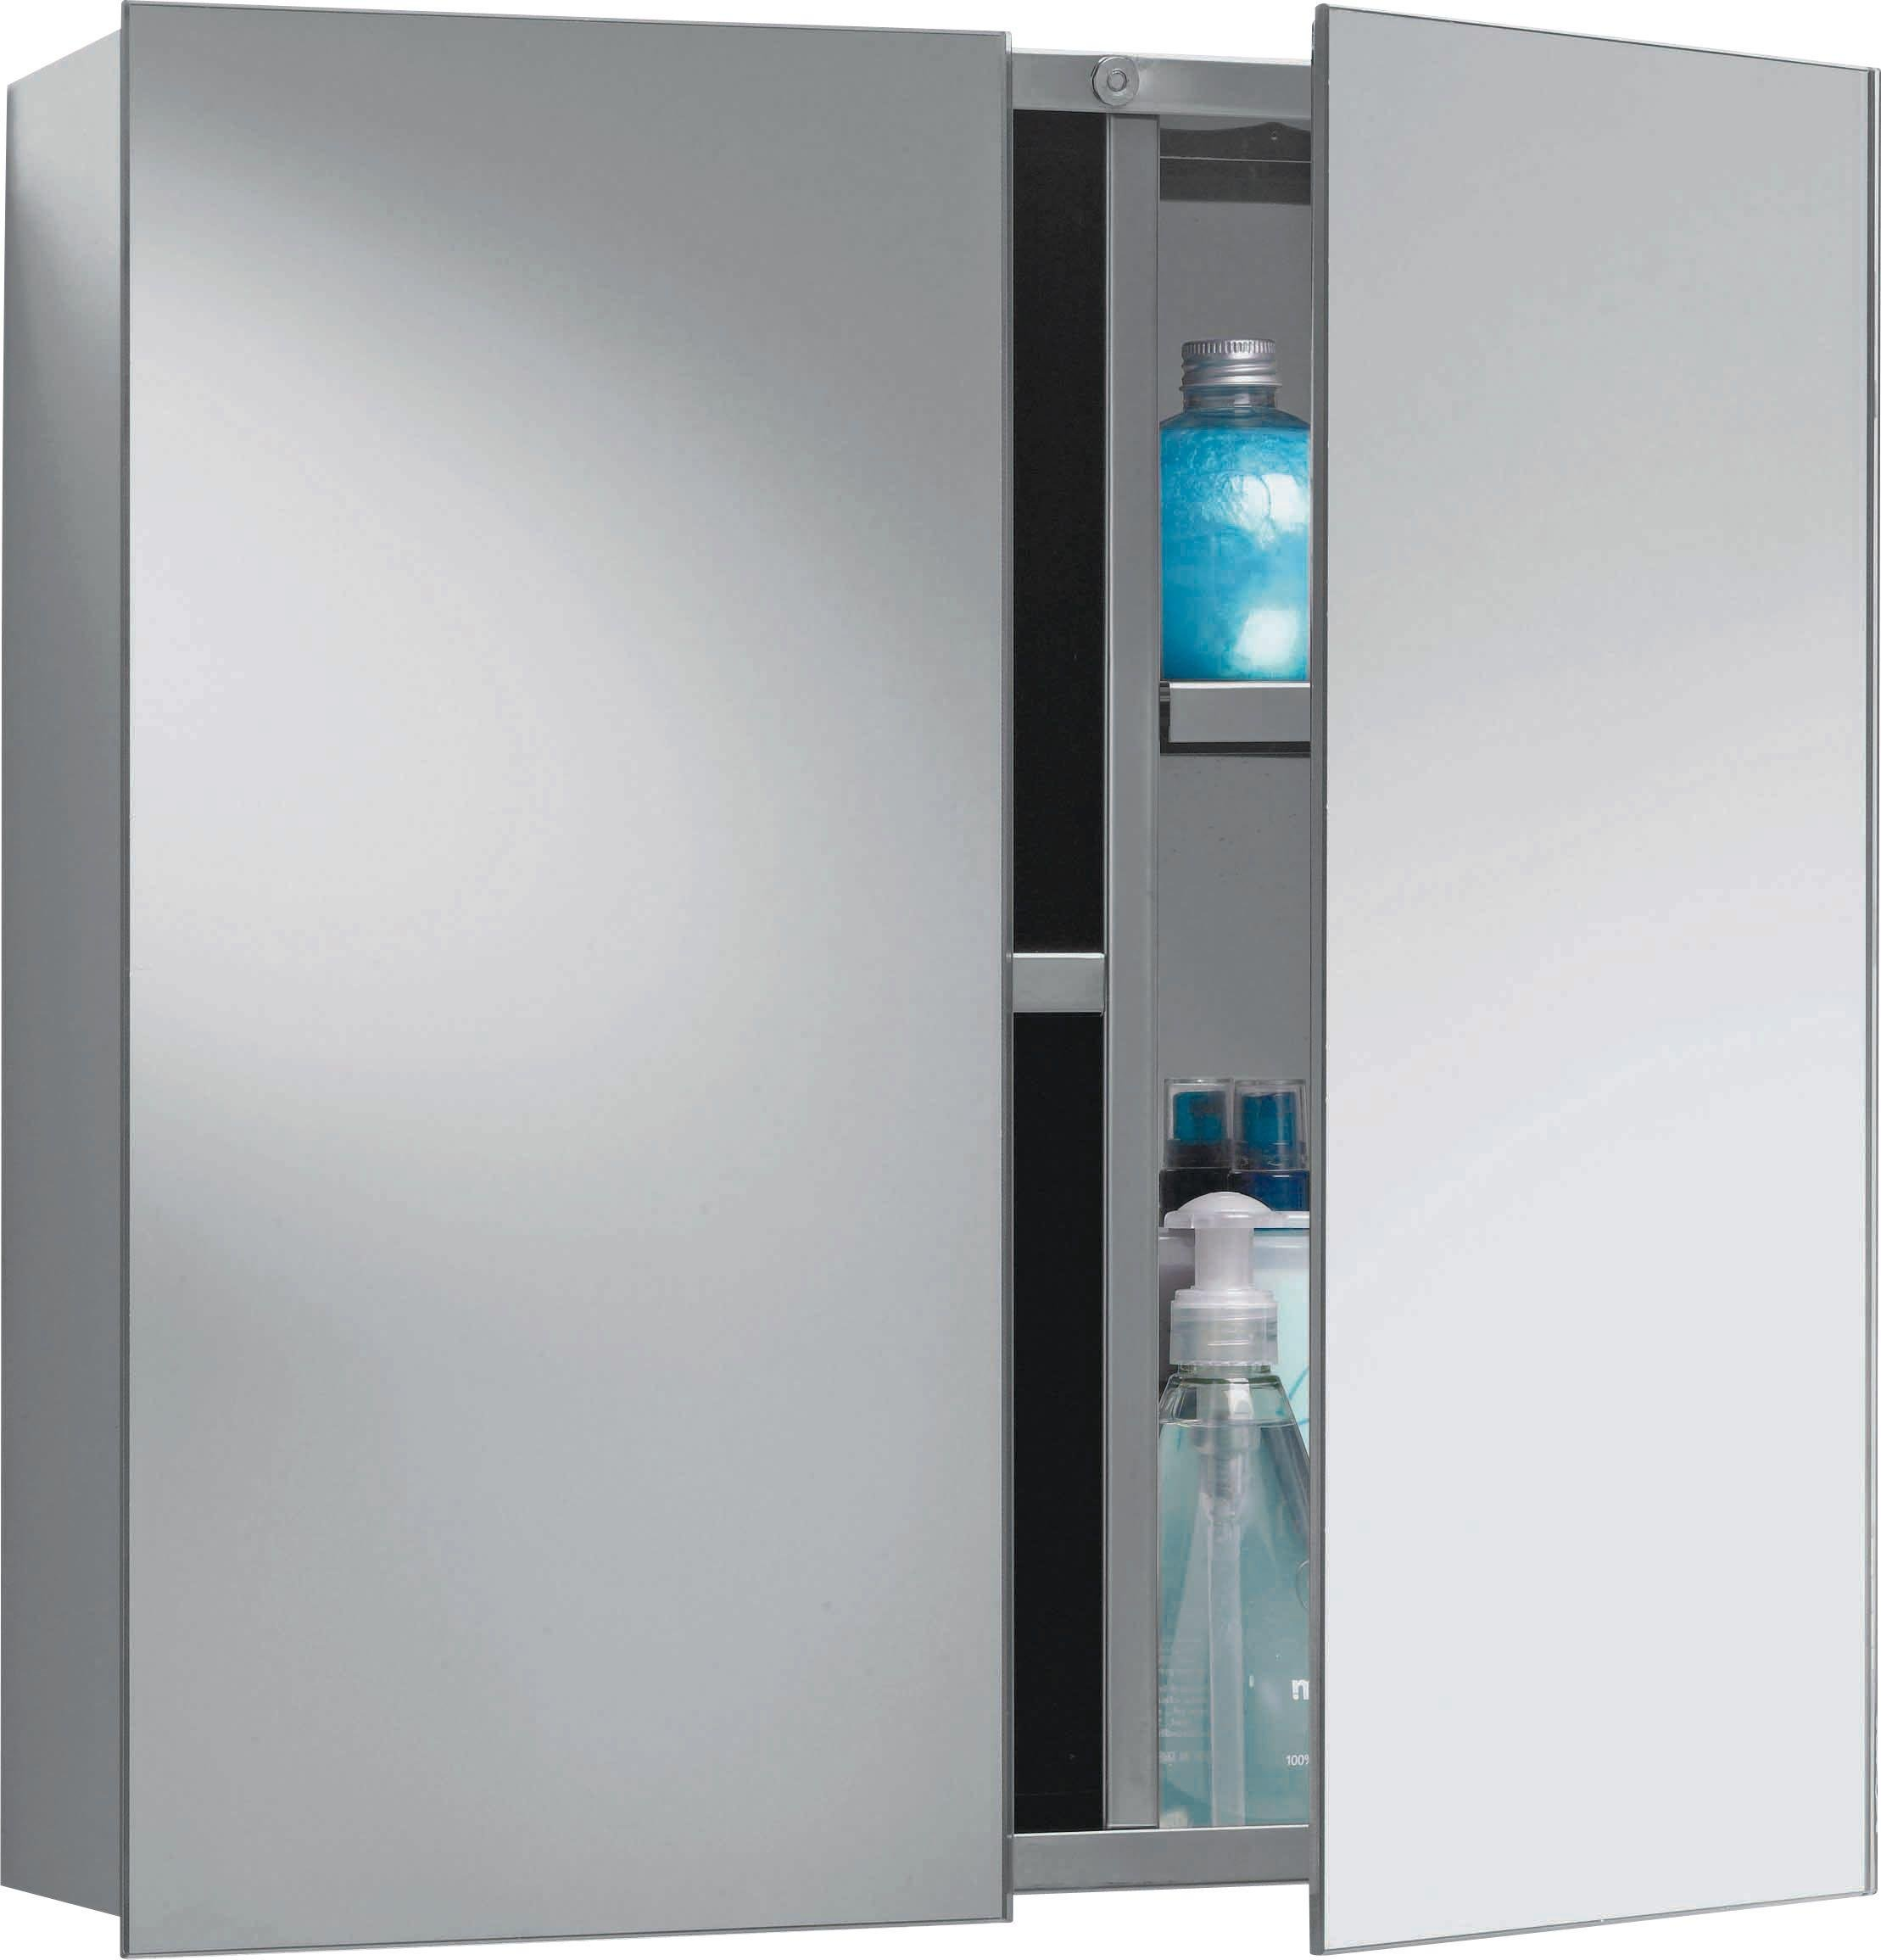 bathroom cabinet with shelf underneath blogs workanyware co uk u2022 rh blogs workanyware co uk